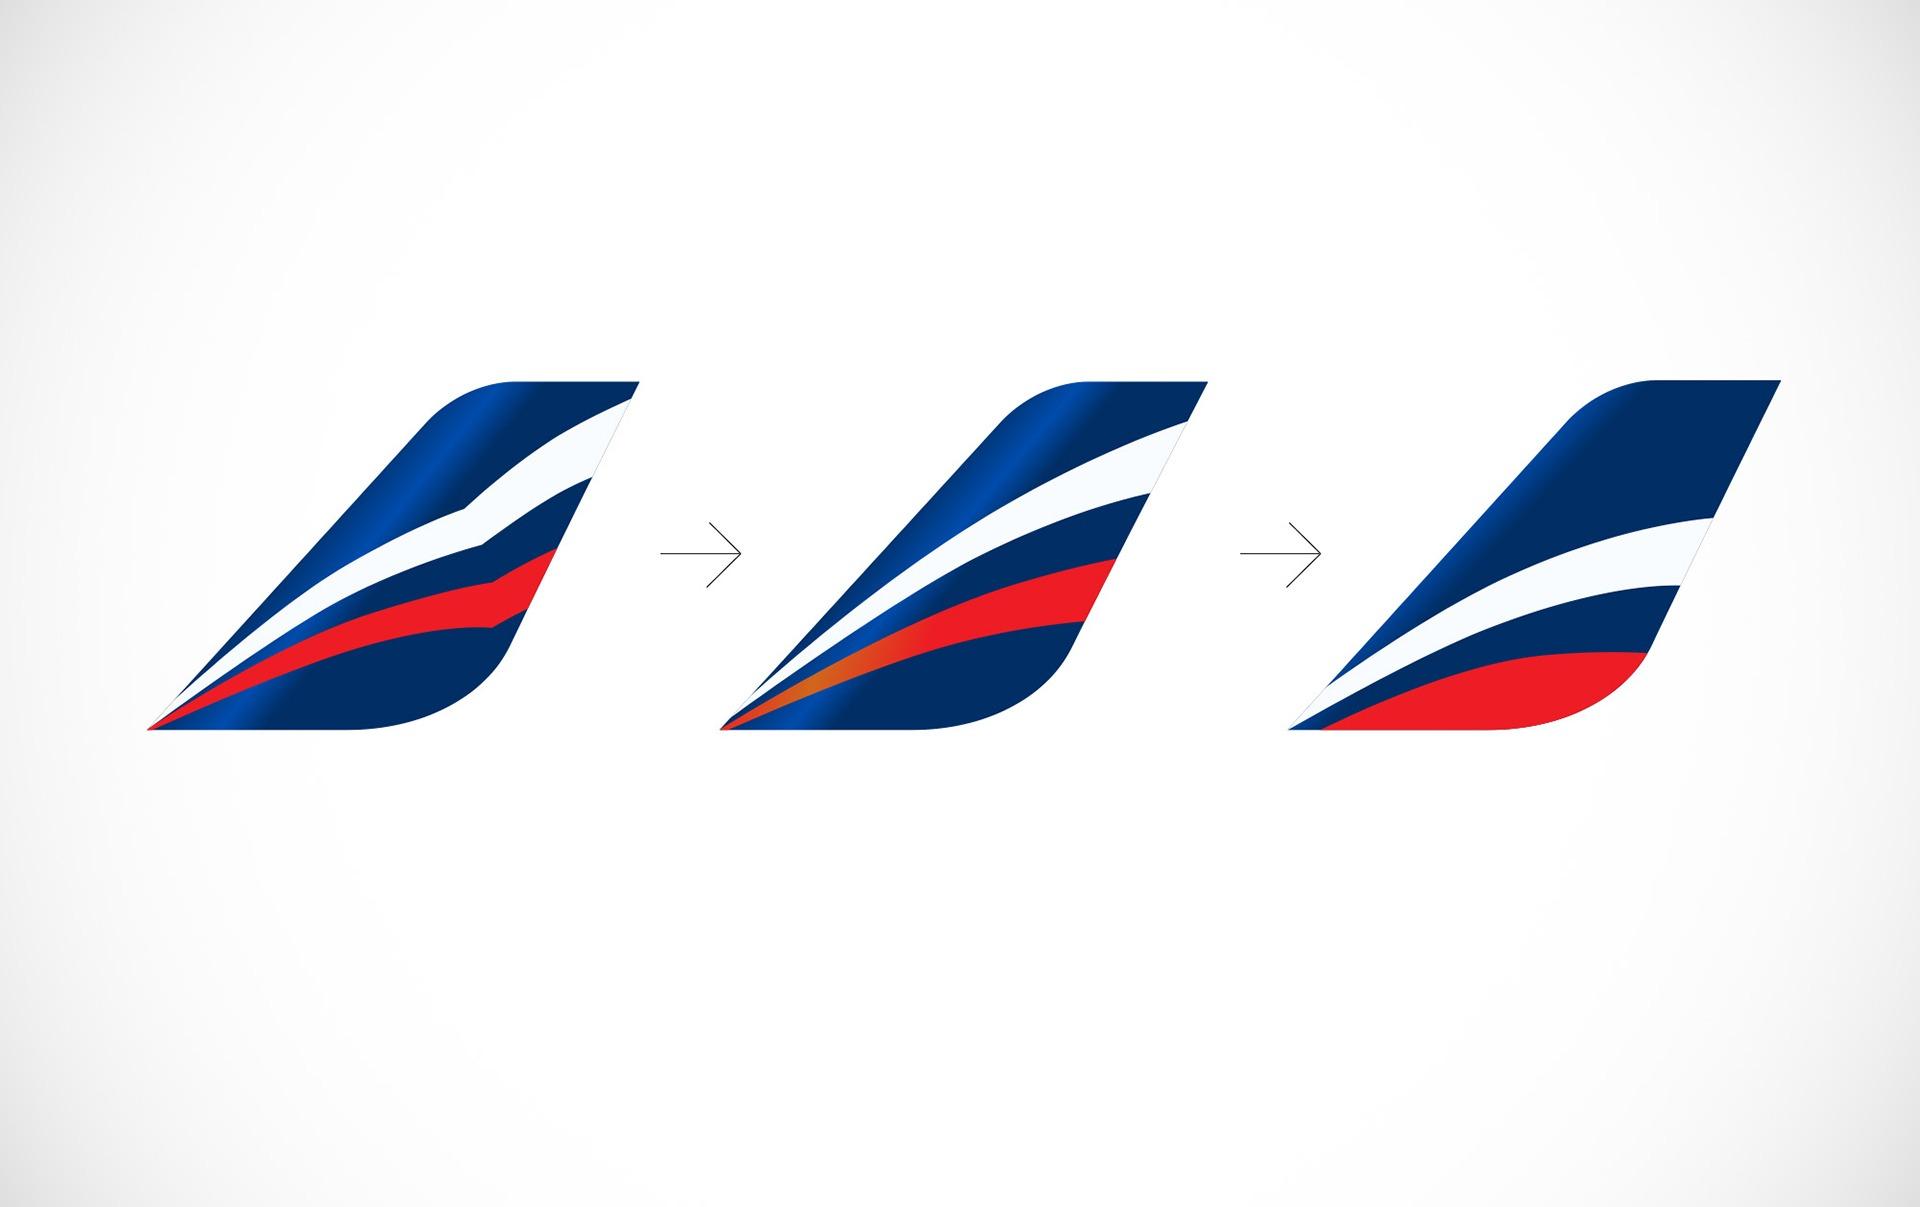 Aeroflot brand identity, брендинг авиакомпании, Asgard Branding, лого Аэрофлот, logo